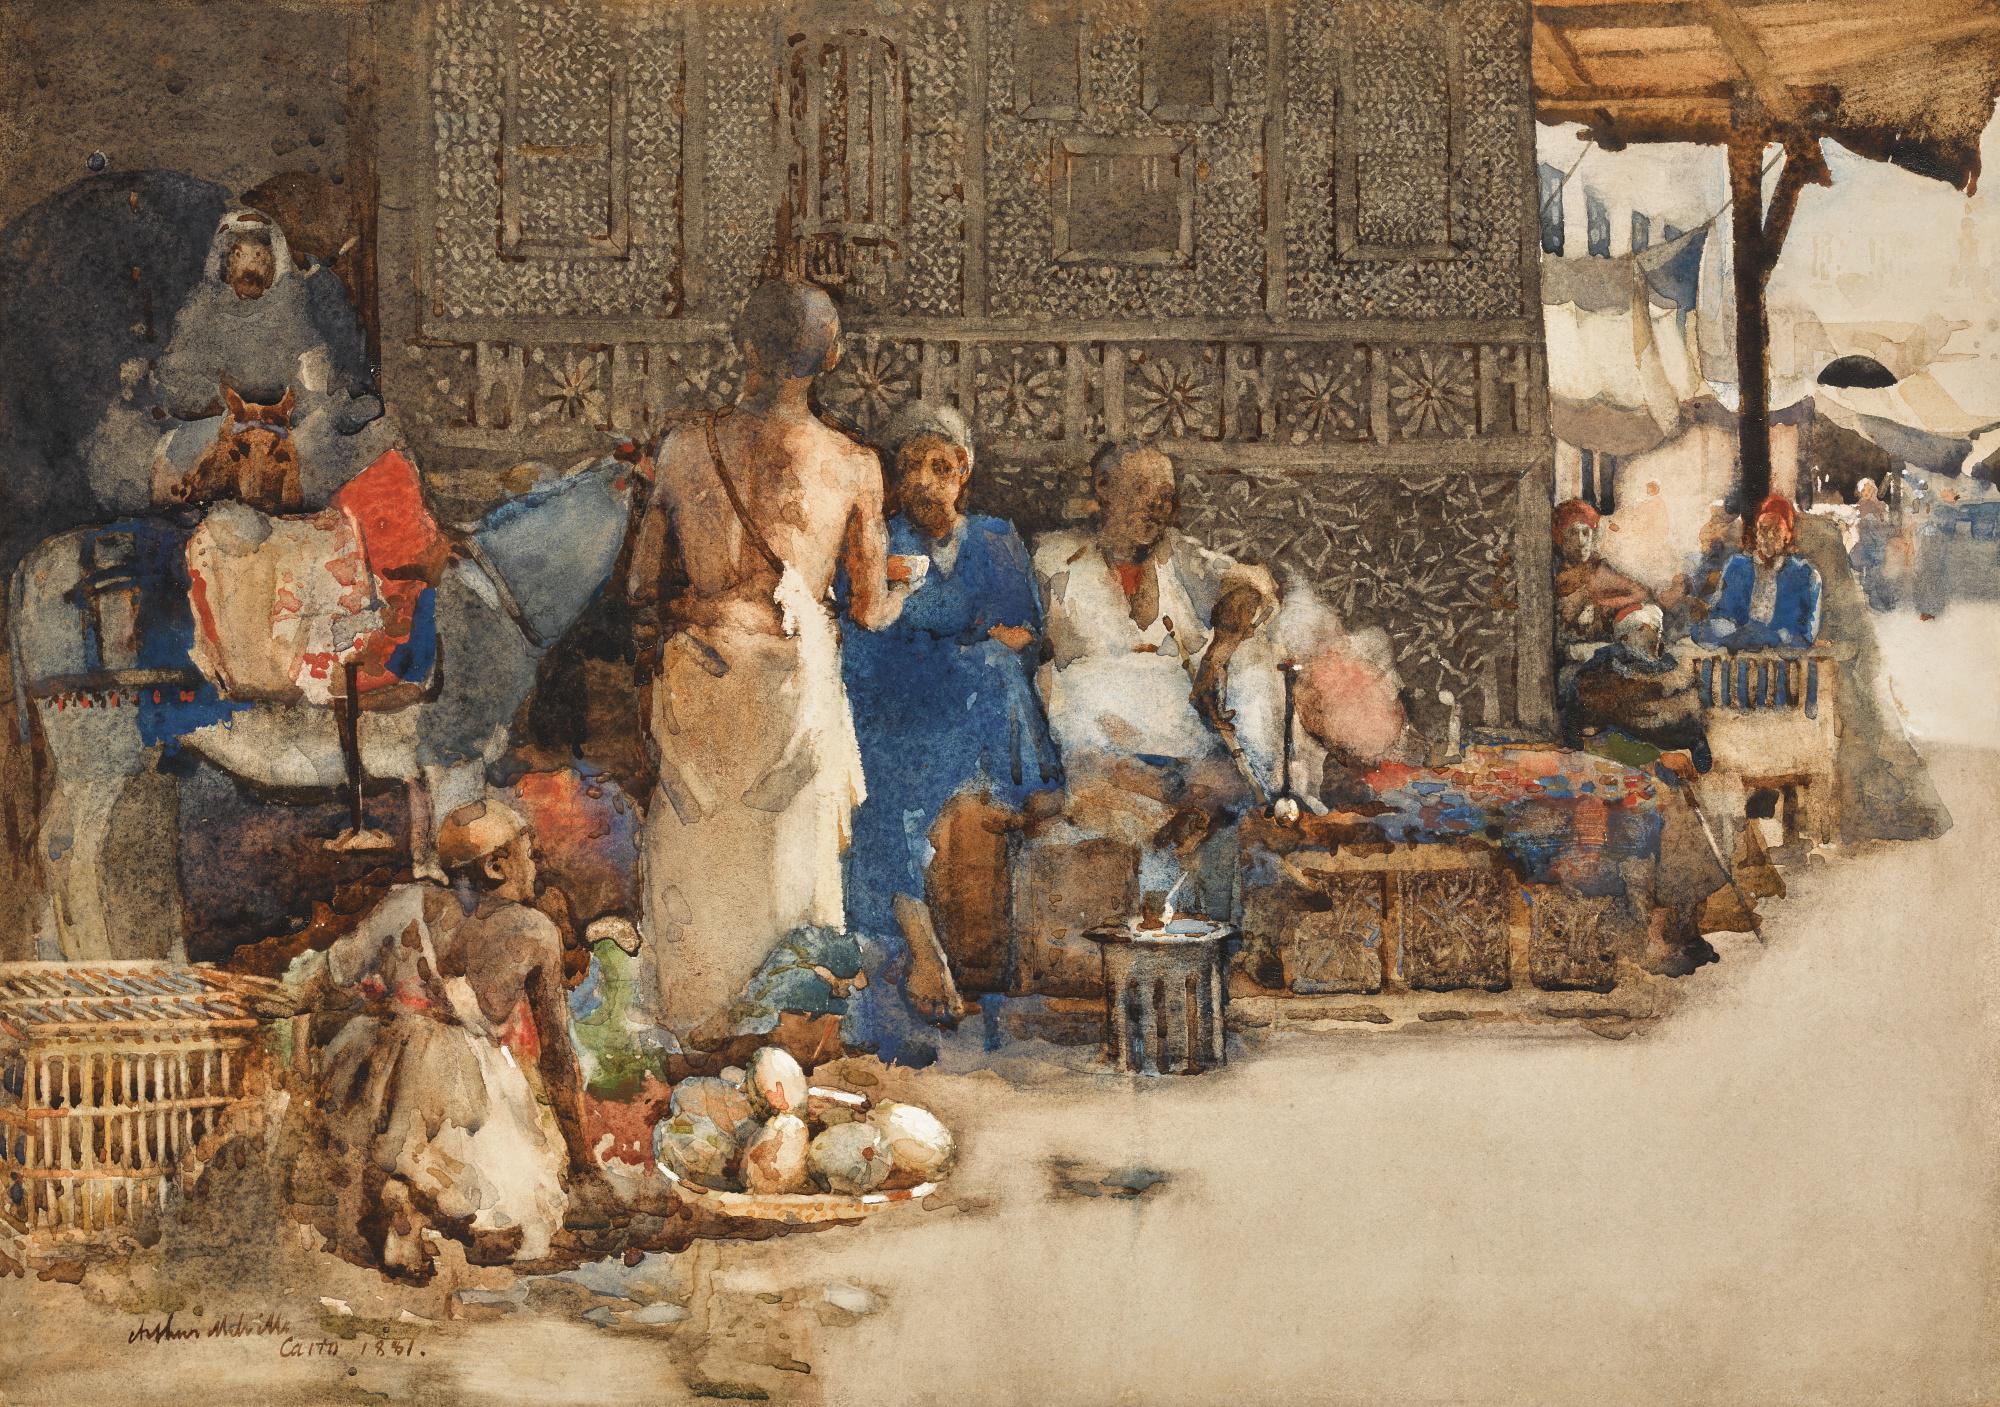 ARTHUR MELVILLE, A.R.S.A., R.S.W. A.R.S. | A CAIRO COFFEE STALL